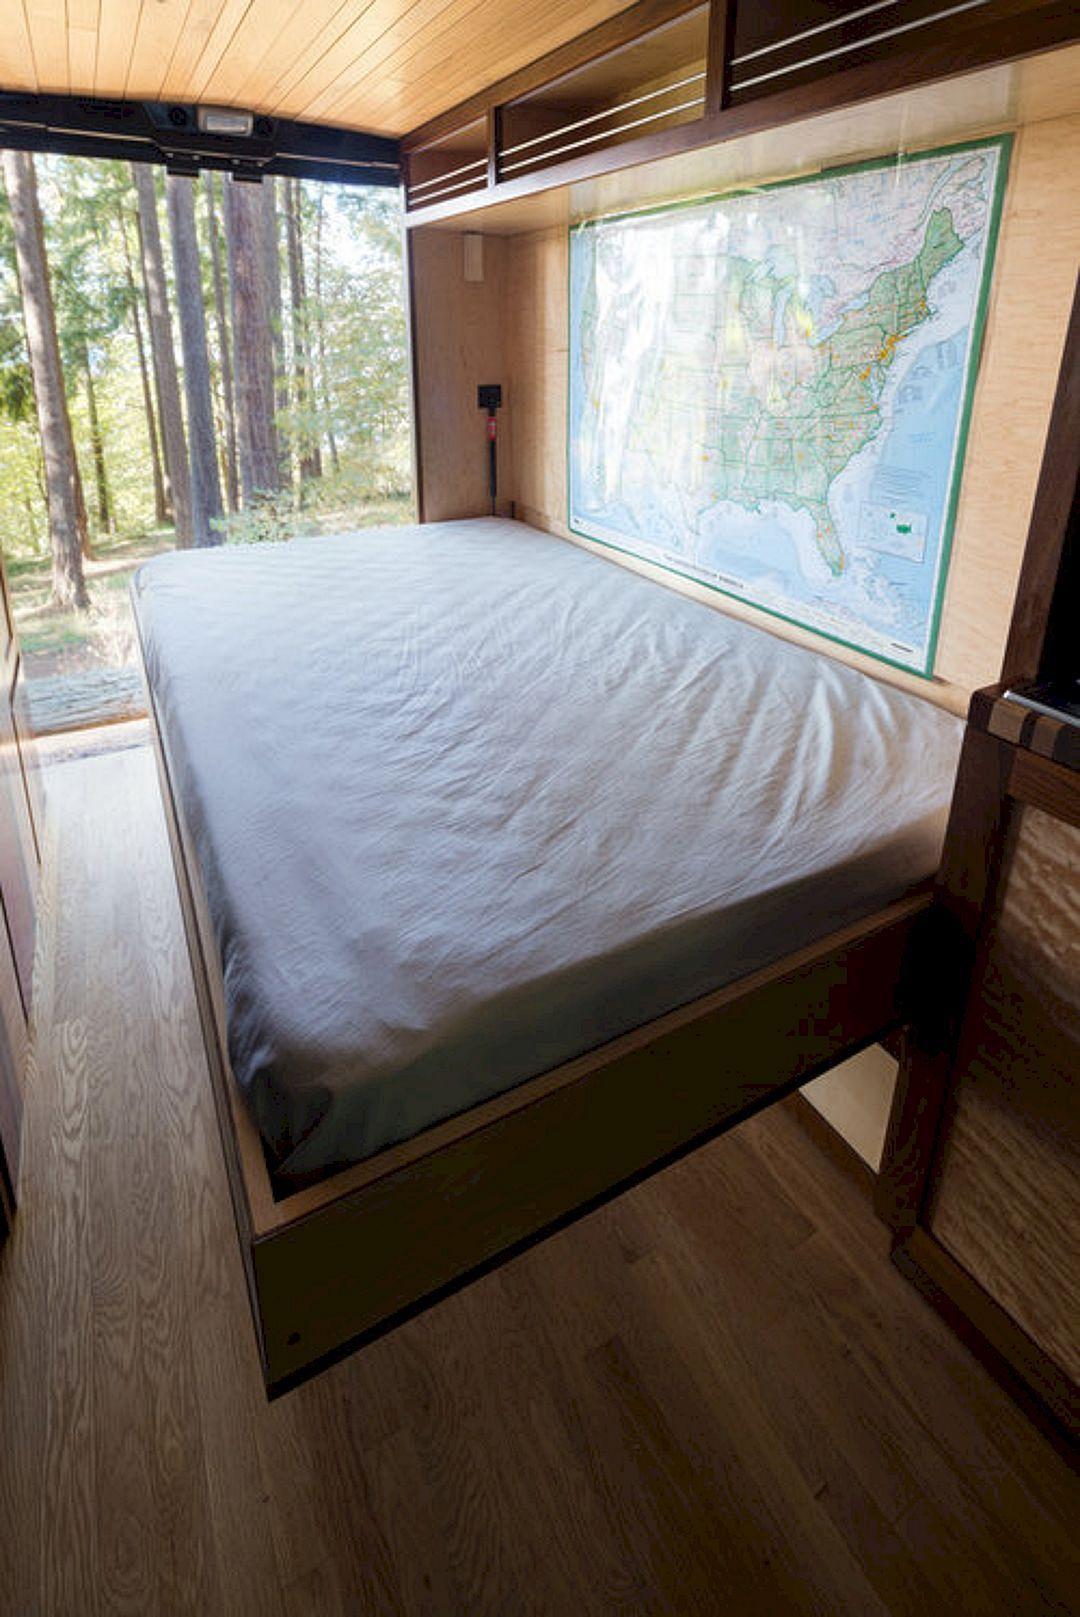 60 Impressive Interior Design and Decor Ideas for Camper Van